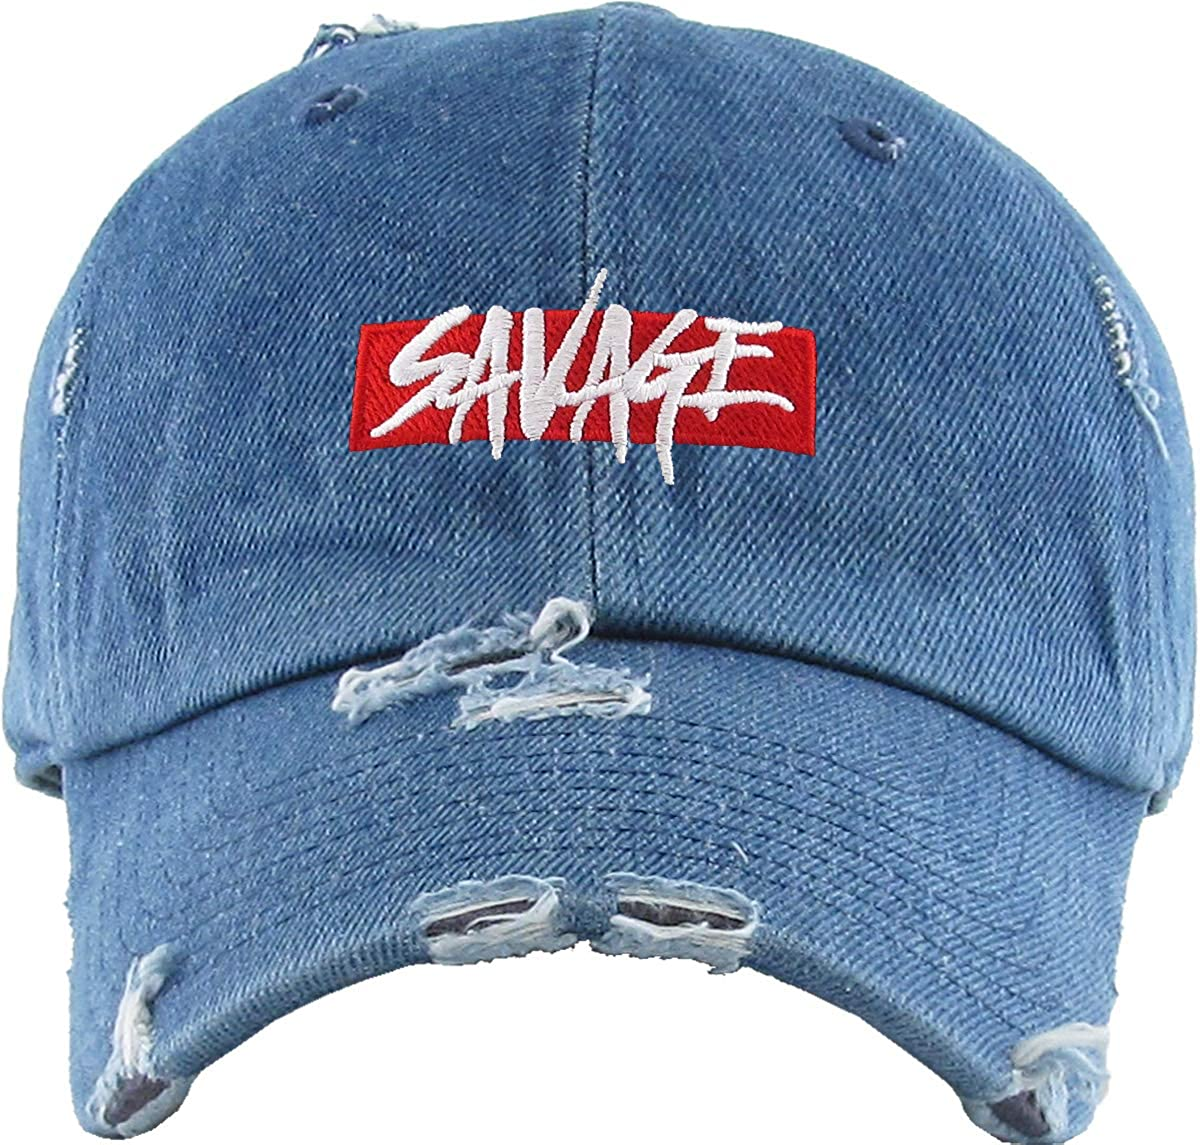 KBETHOS King Savage Legend G.O.A.T Dad Hat Baseball Cap Polo Style Unconstructed Cotton Adjustable Unisex